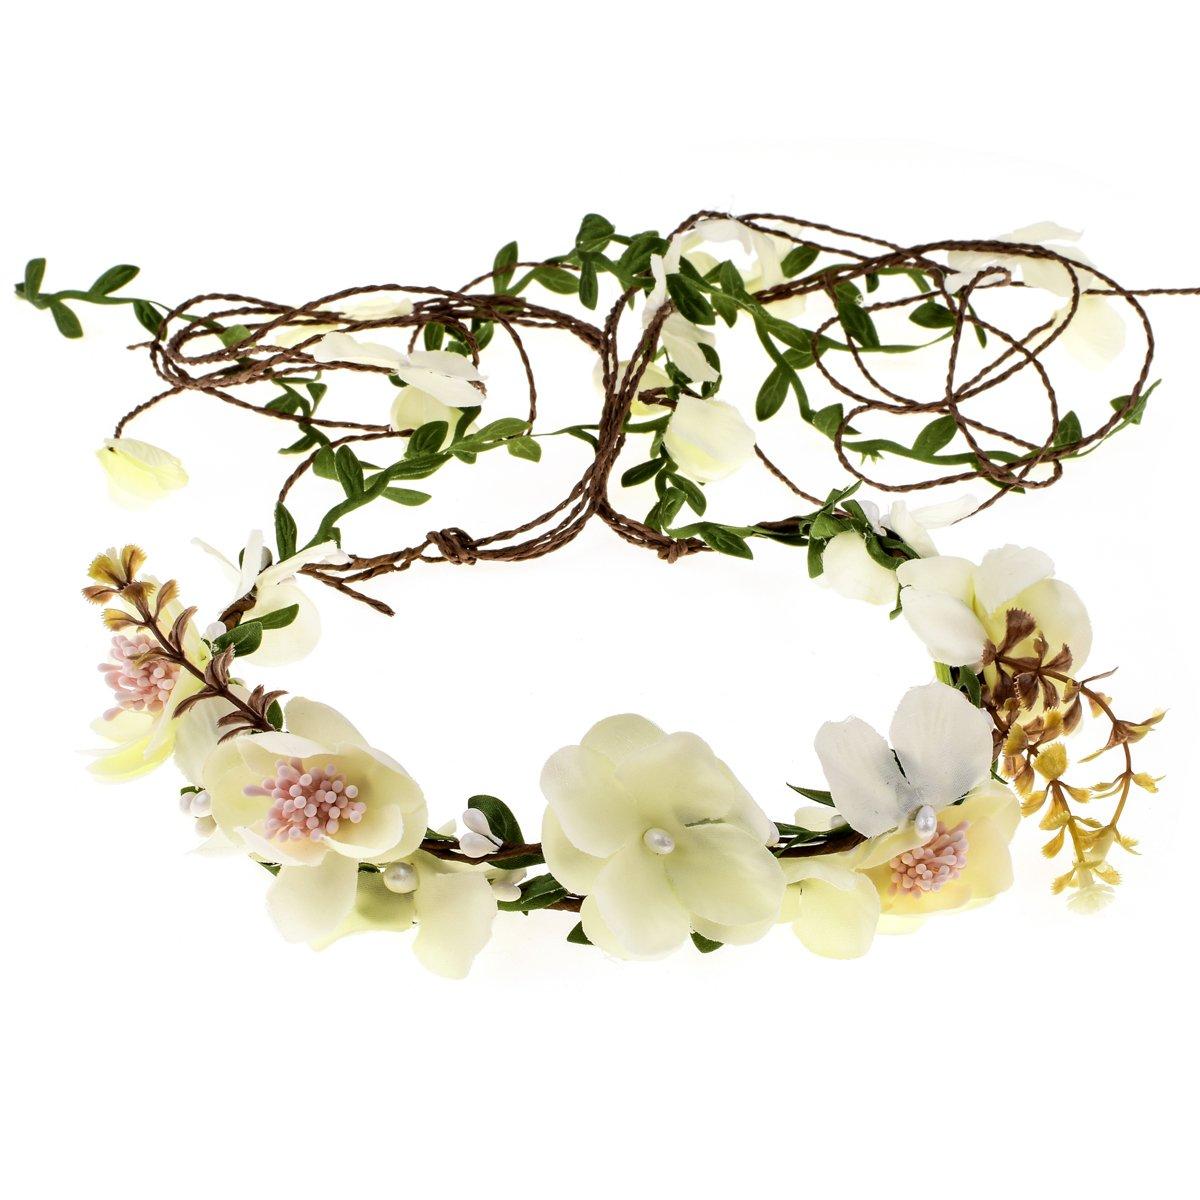 Floral Fall Adjustable Bridal Flower Garland Headband Flower Crown Hair Wreath Halo F-83 (Off-White)